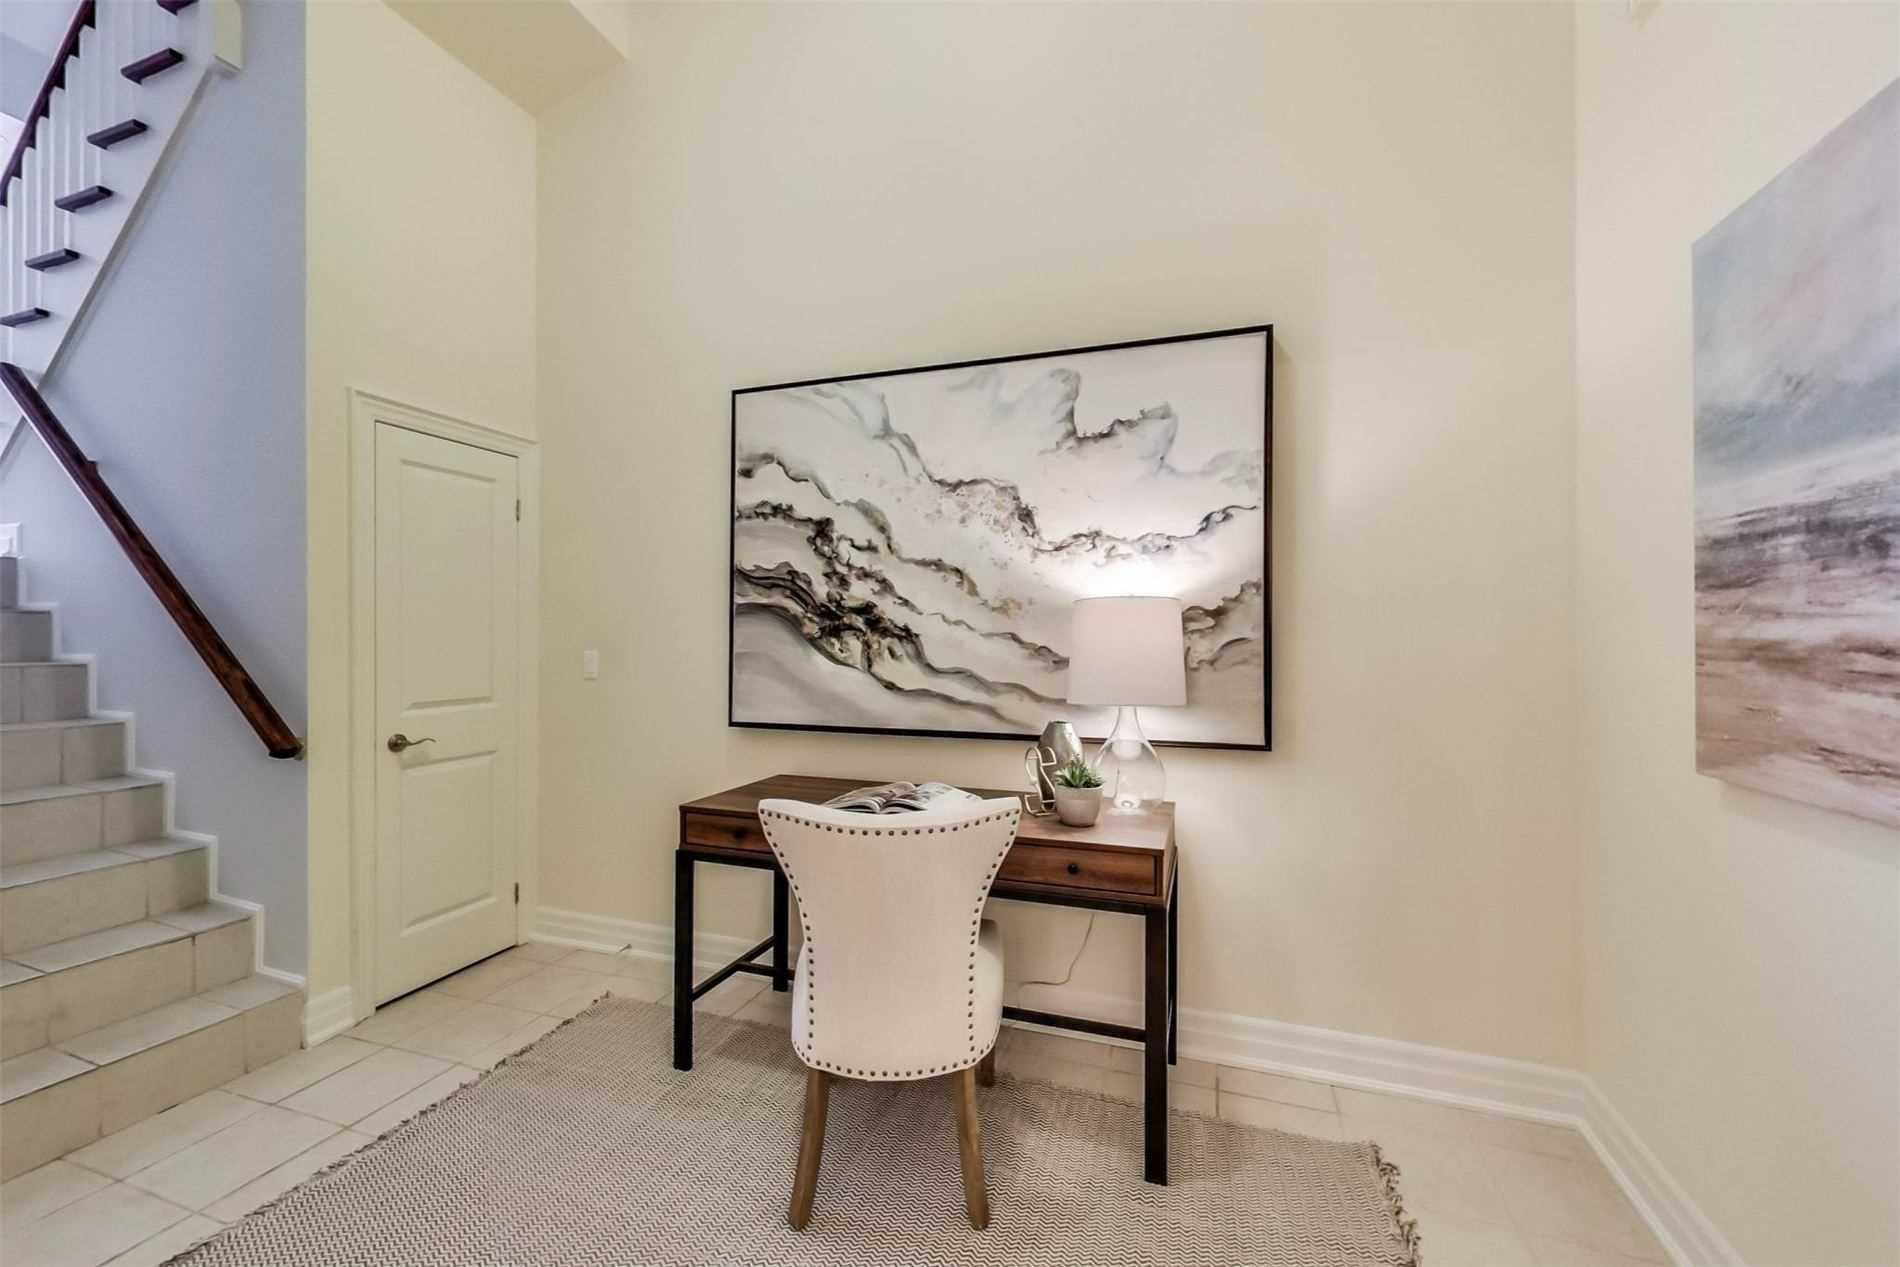 Photo 26: Photos: 213 Heward Avenue in Toronto: South Riverdale House (3-Storey) for sale (Toronto E01)  : MLS®# E4941877